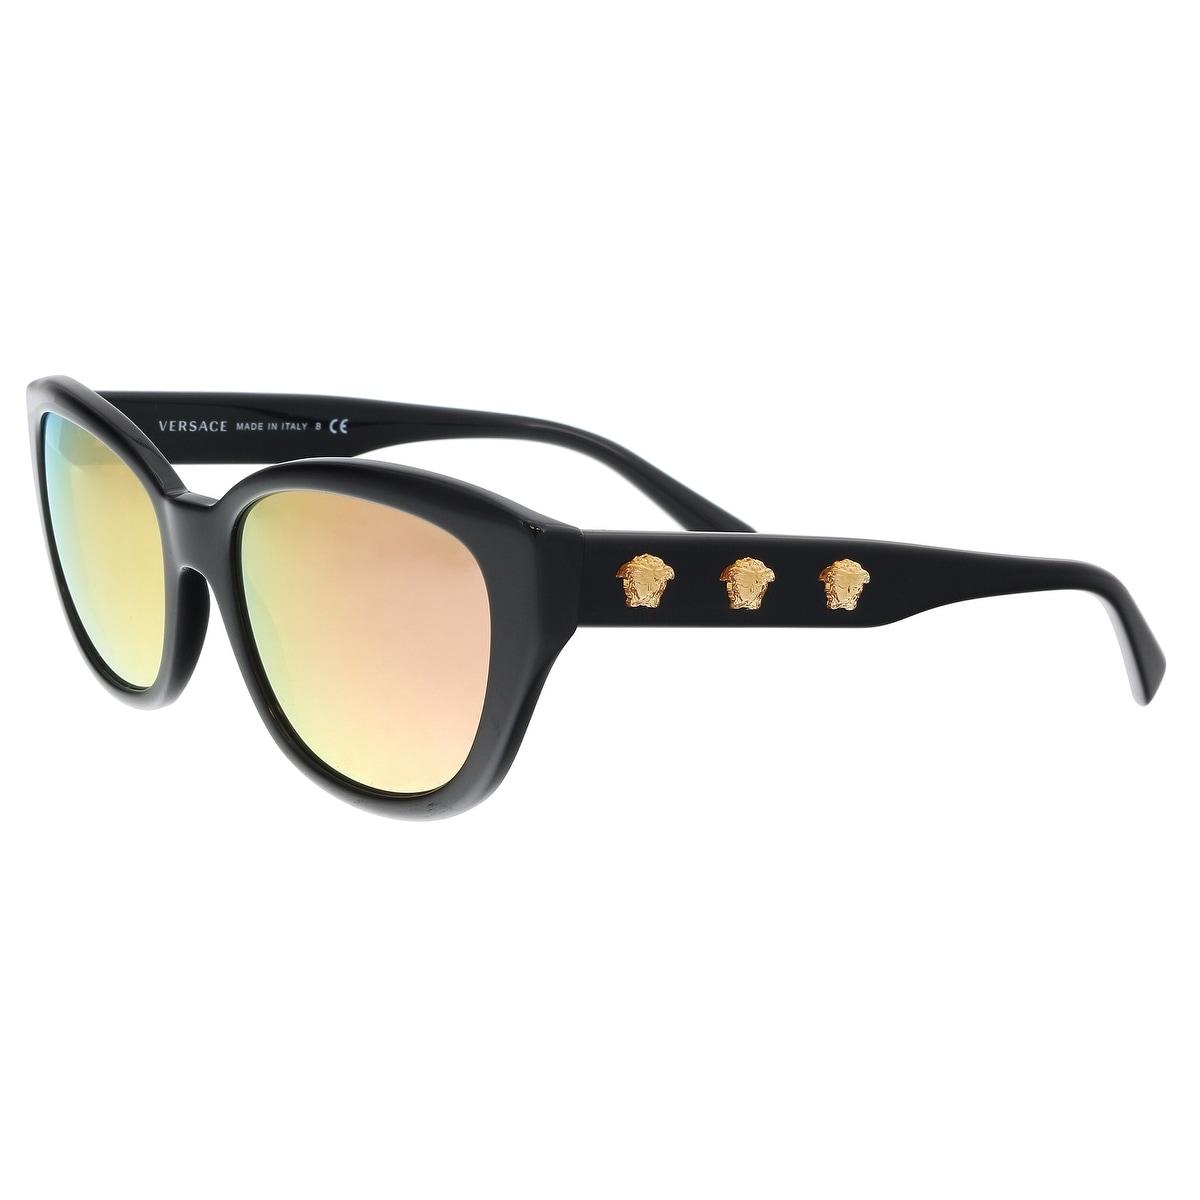 86bf6e96bd Versace Sunglasses | Shop our Best Clothing & Shoes Deals Online at ...